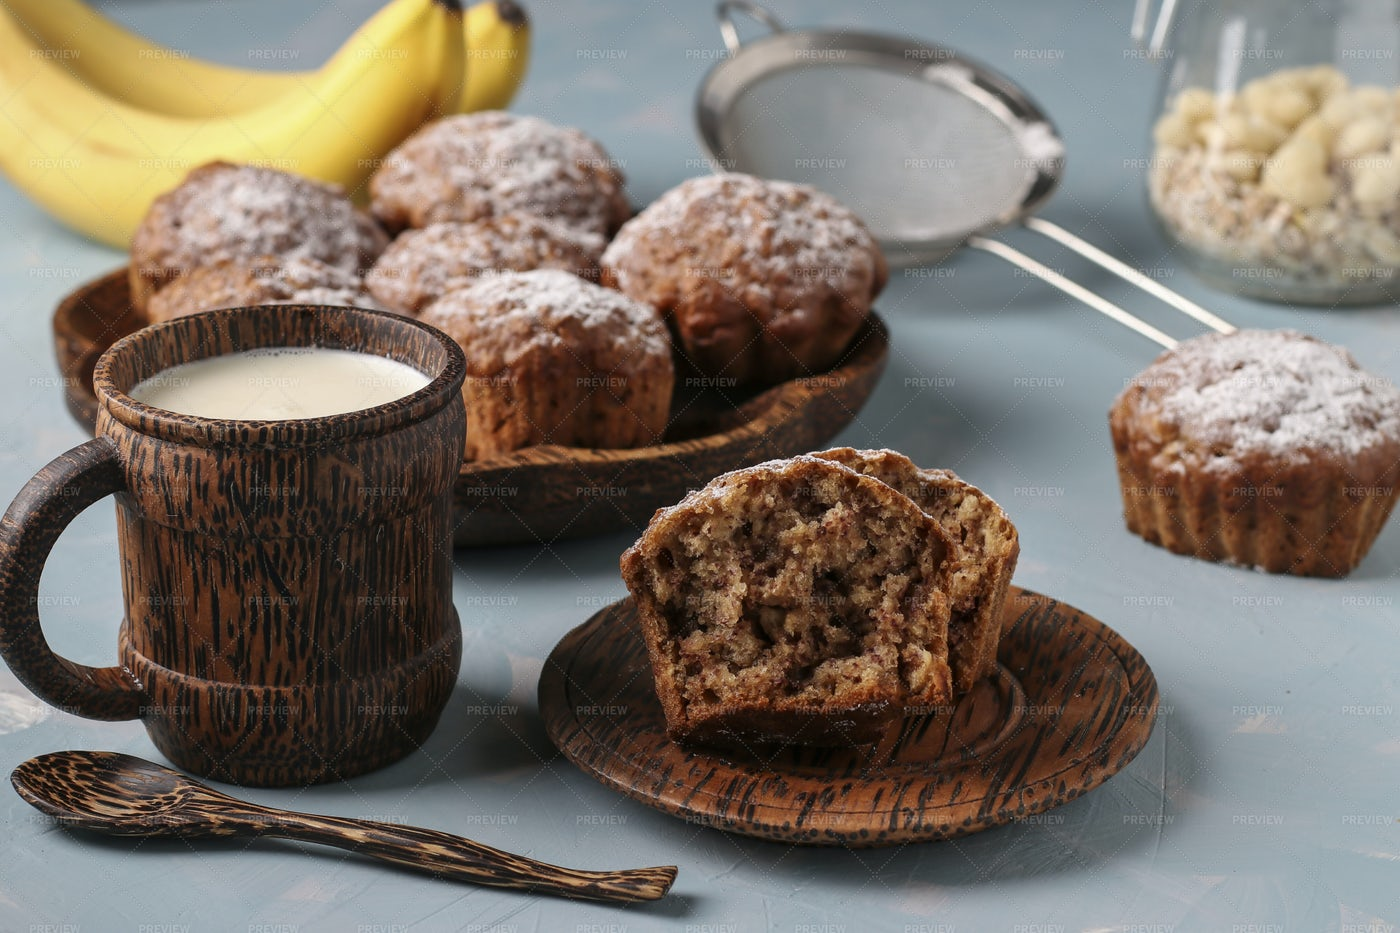 Banana Muffins And Milk: Stock Photos